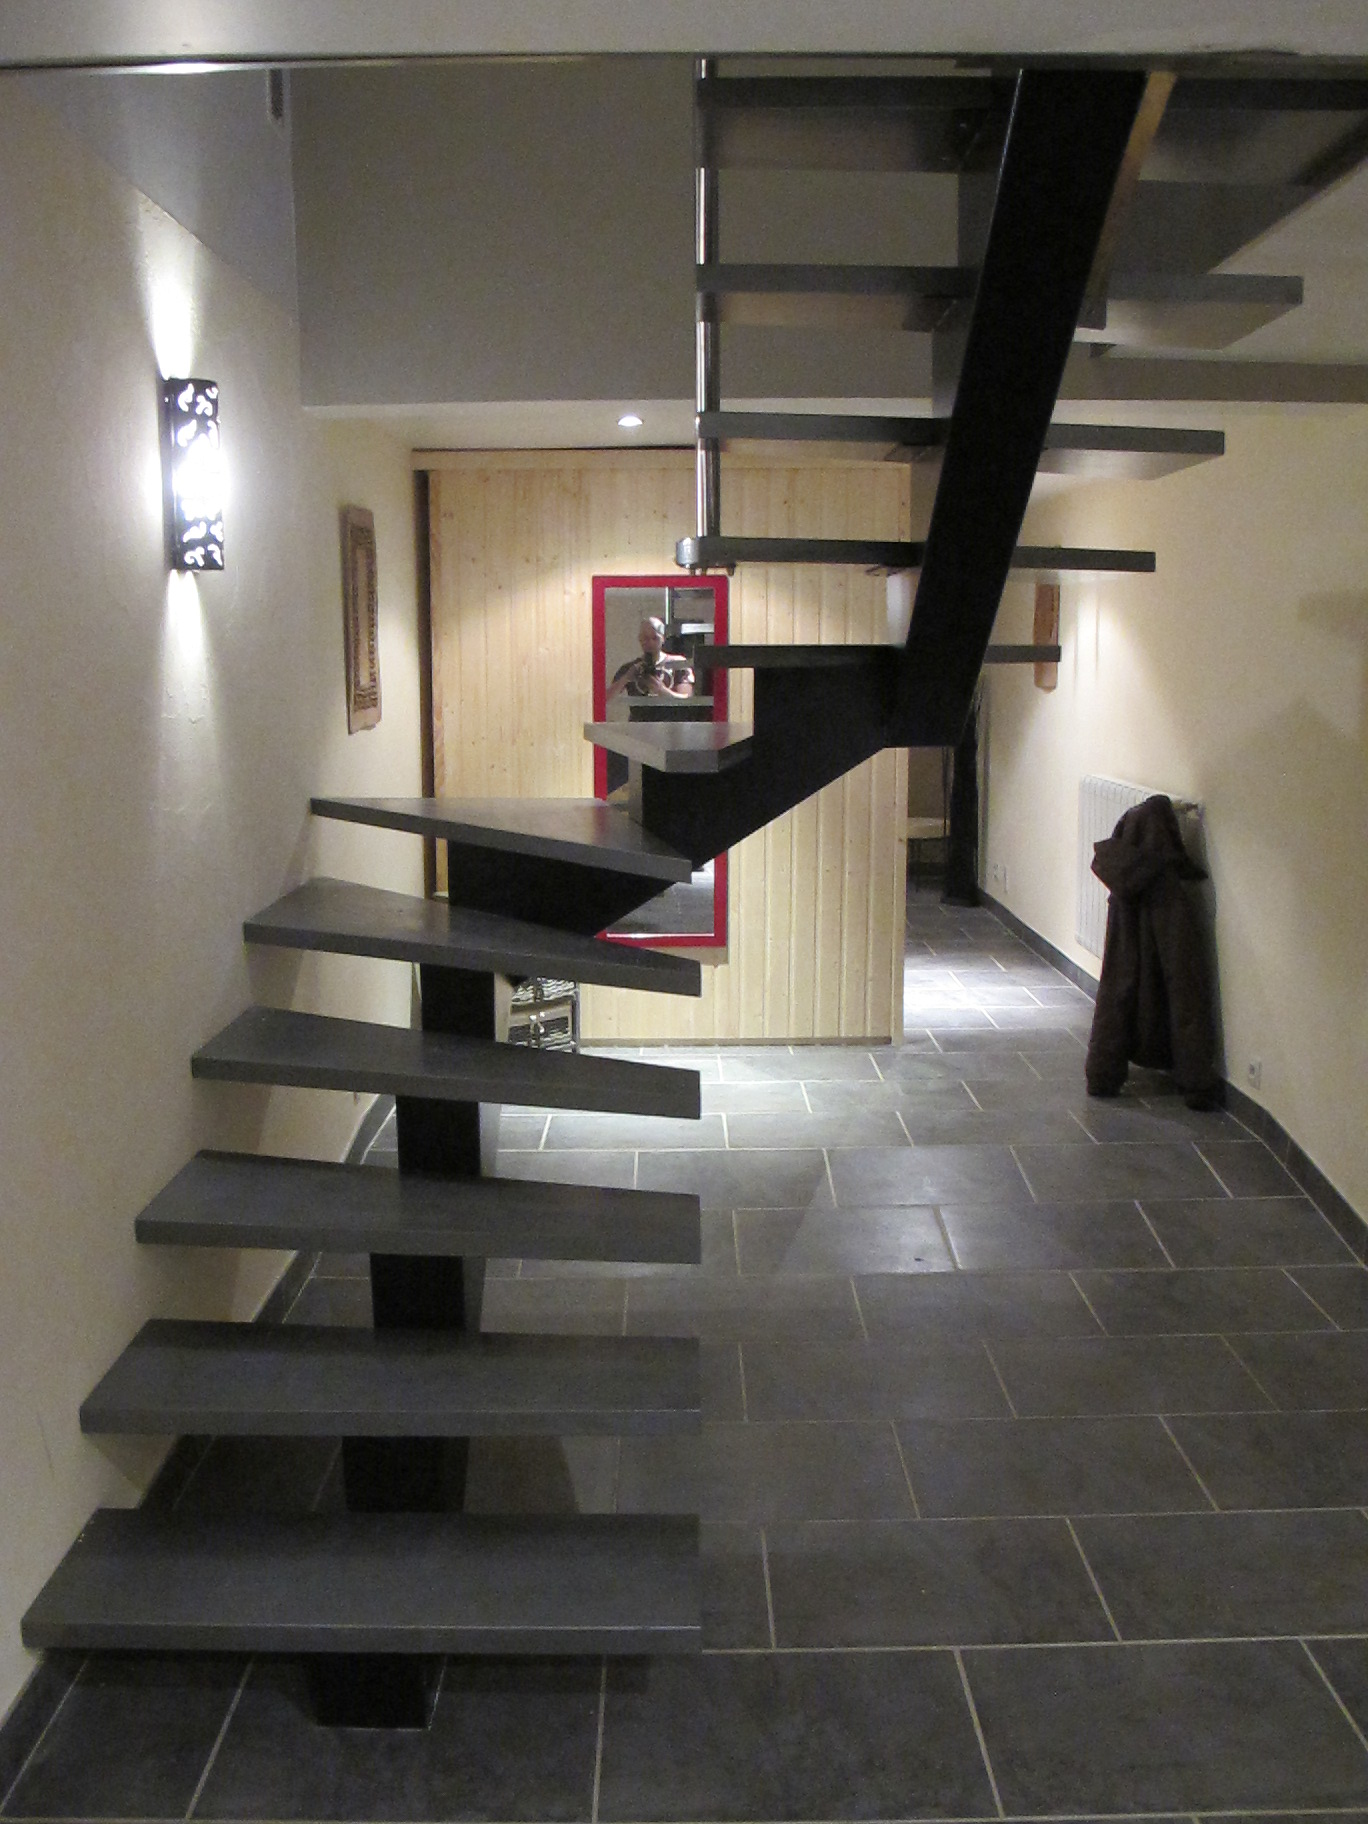 les escaliers en f t atmosphere metallique. Black Bedroom Furniture Sets. Home Design Ideas